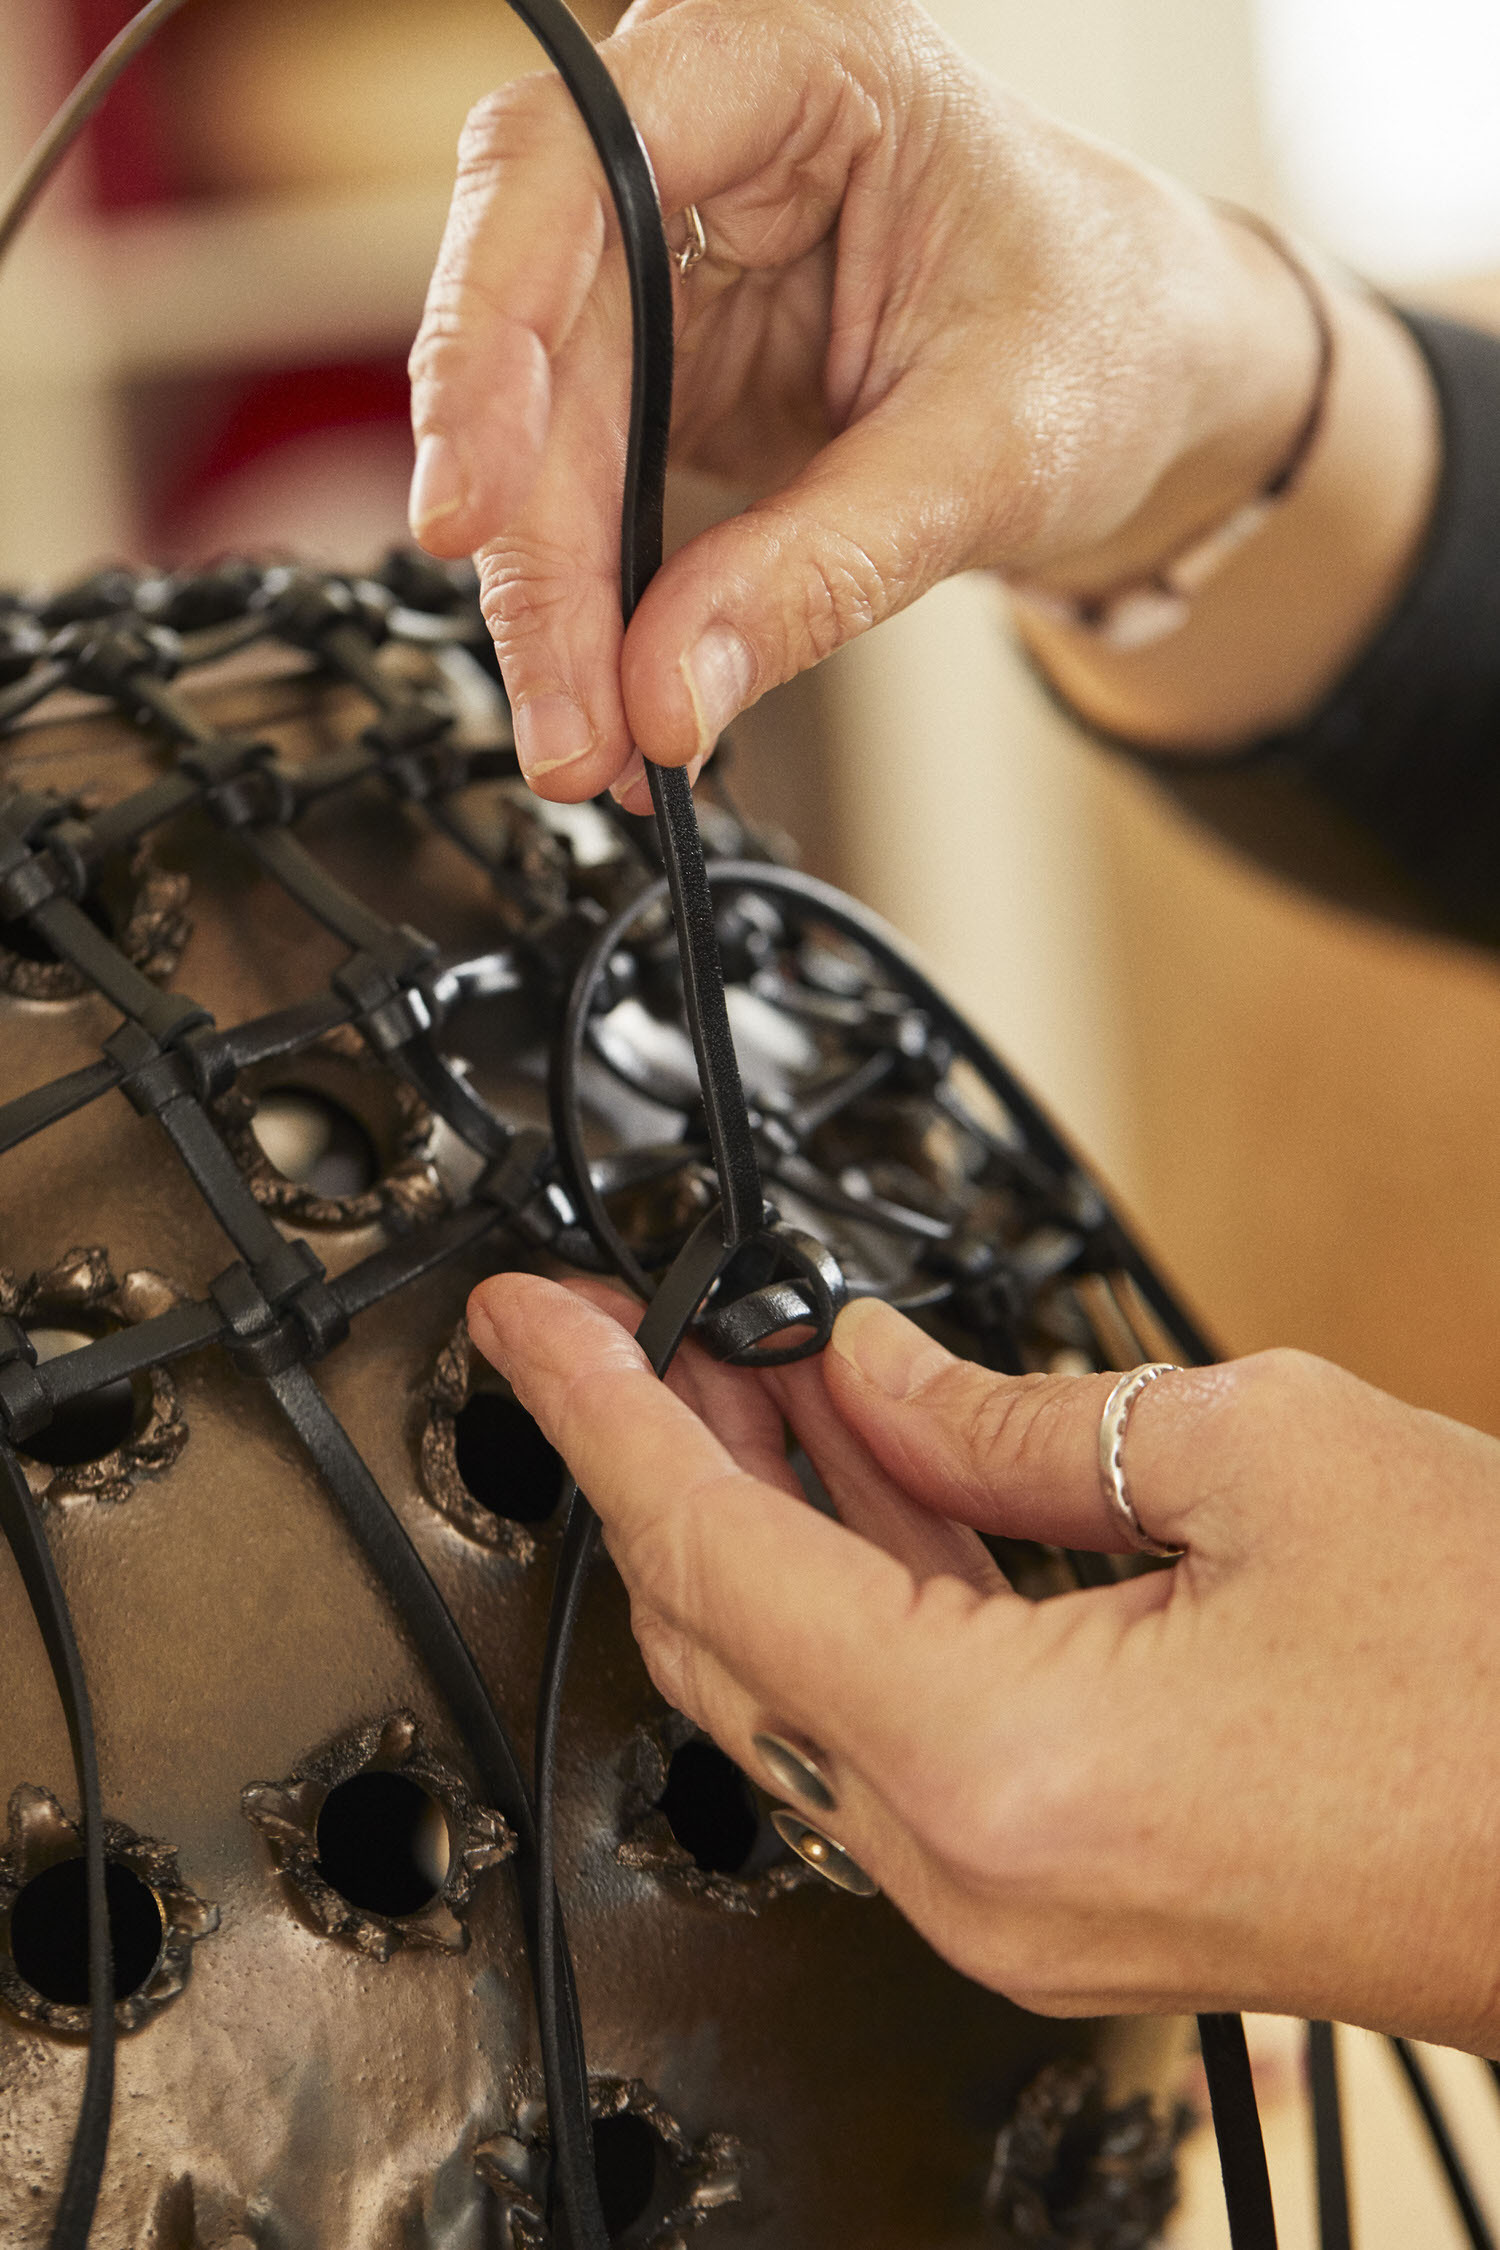 Loewe Waves Weaving Artist Idoia Cuesta Yellowtrace 12